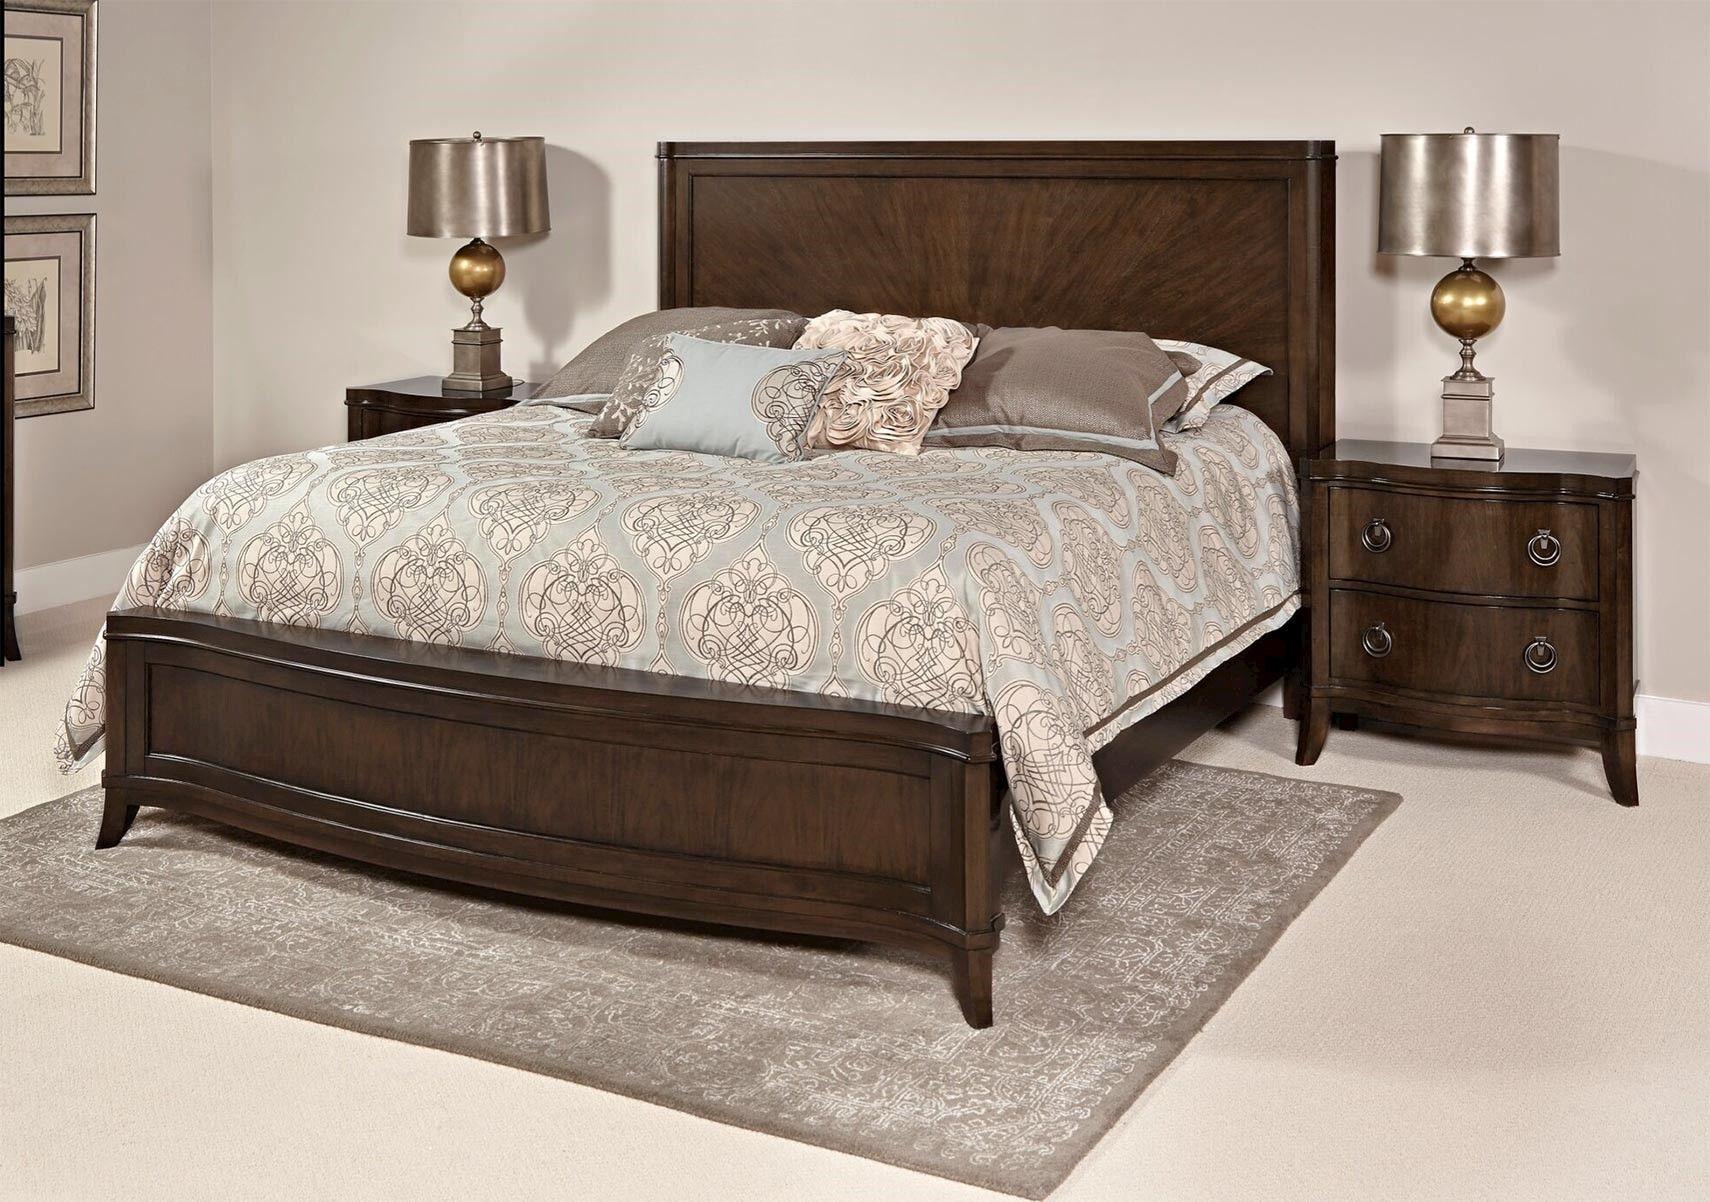 Lacks | Ian 4-Pc King Bedroom Set | Bedrooms | King bedroom sets ...